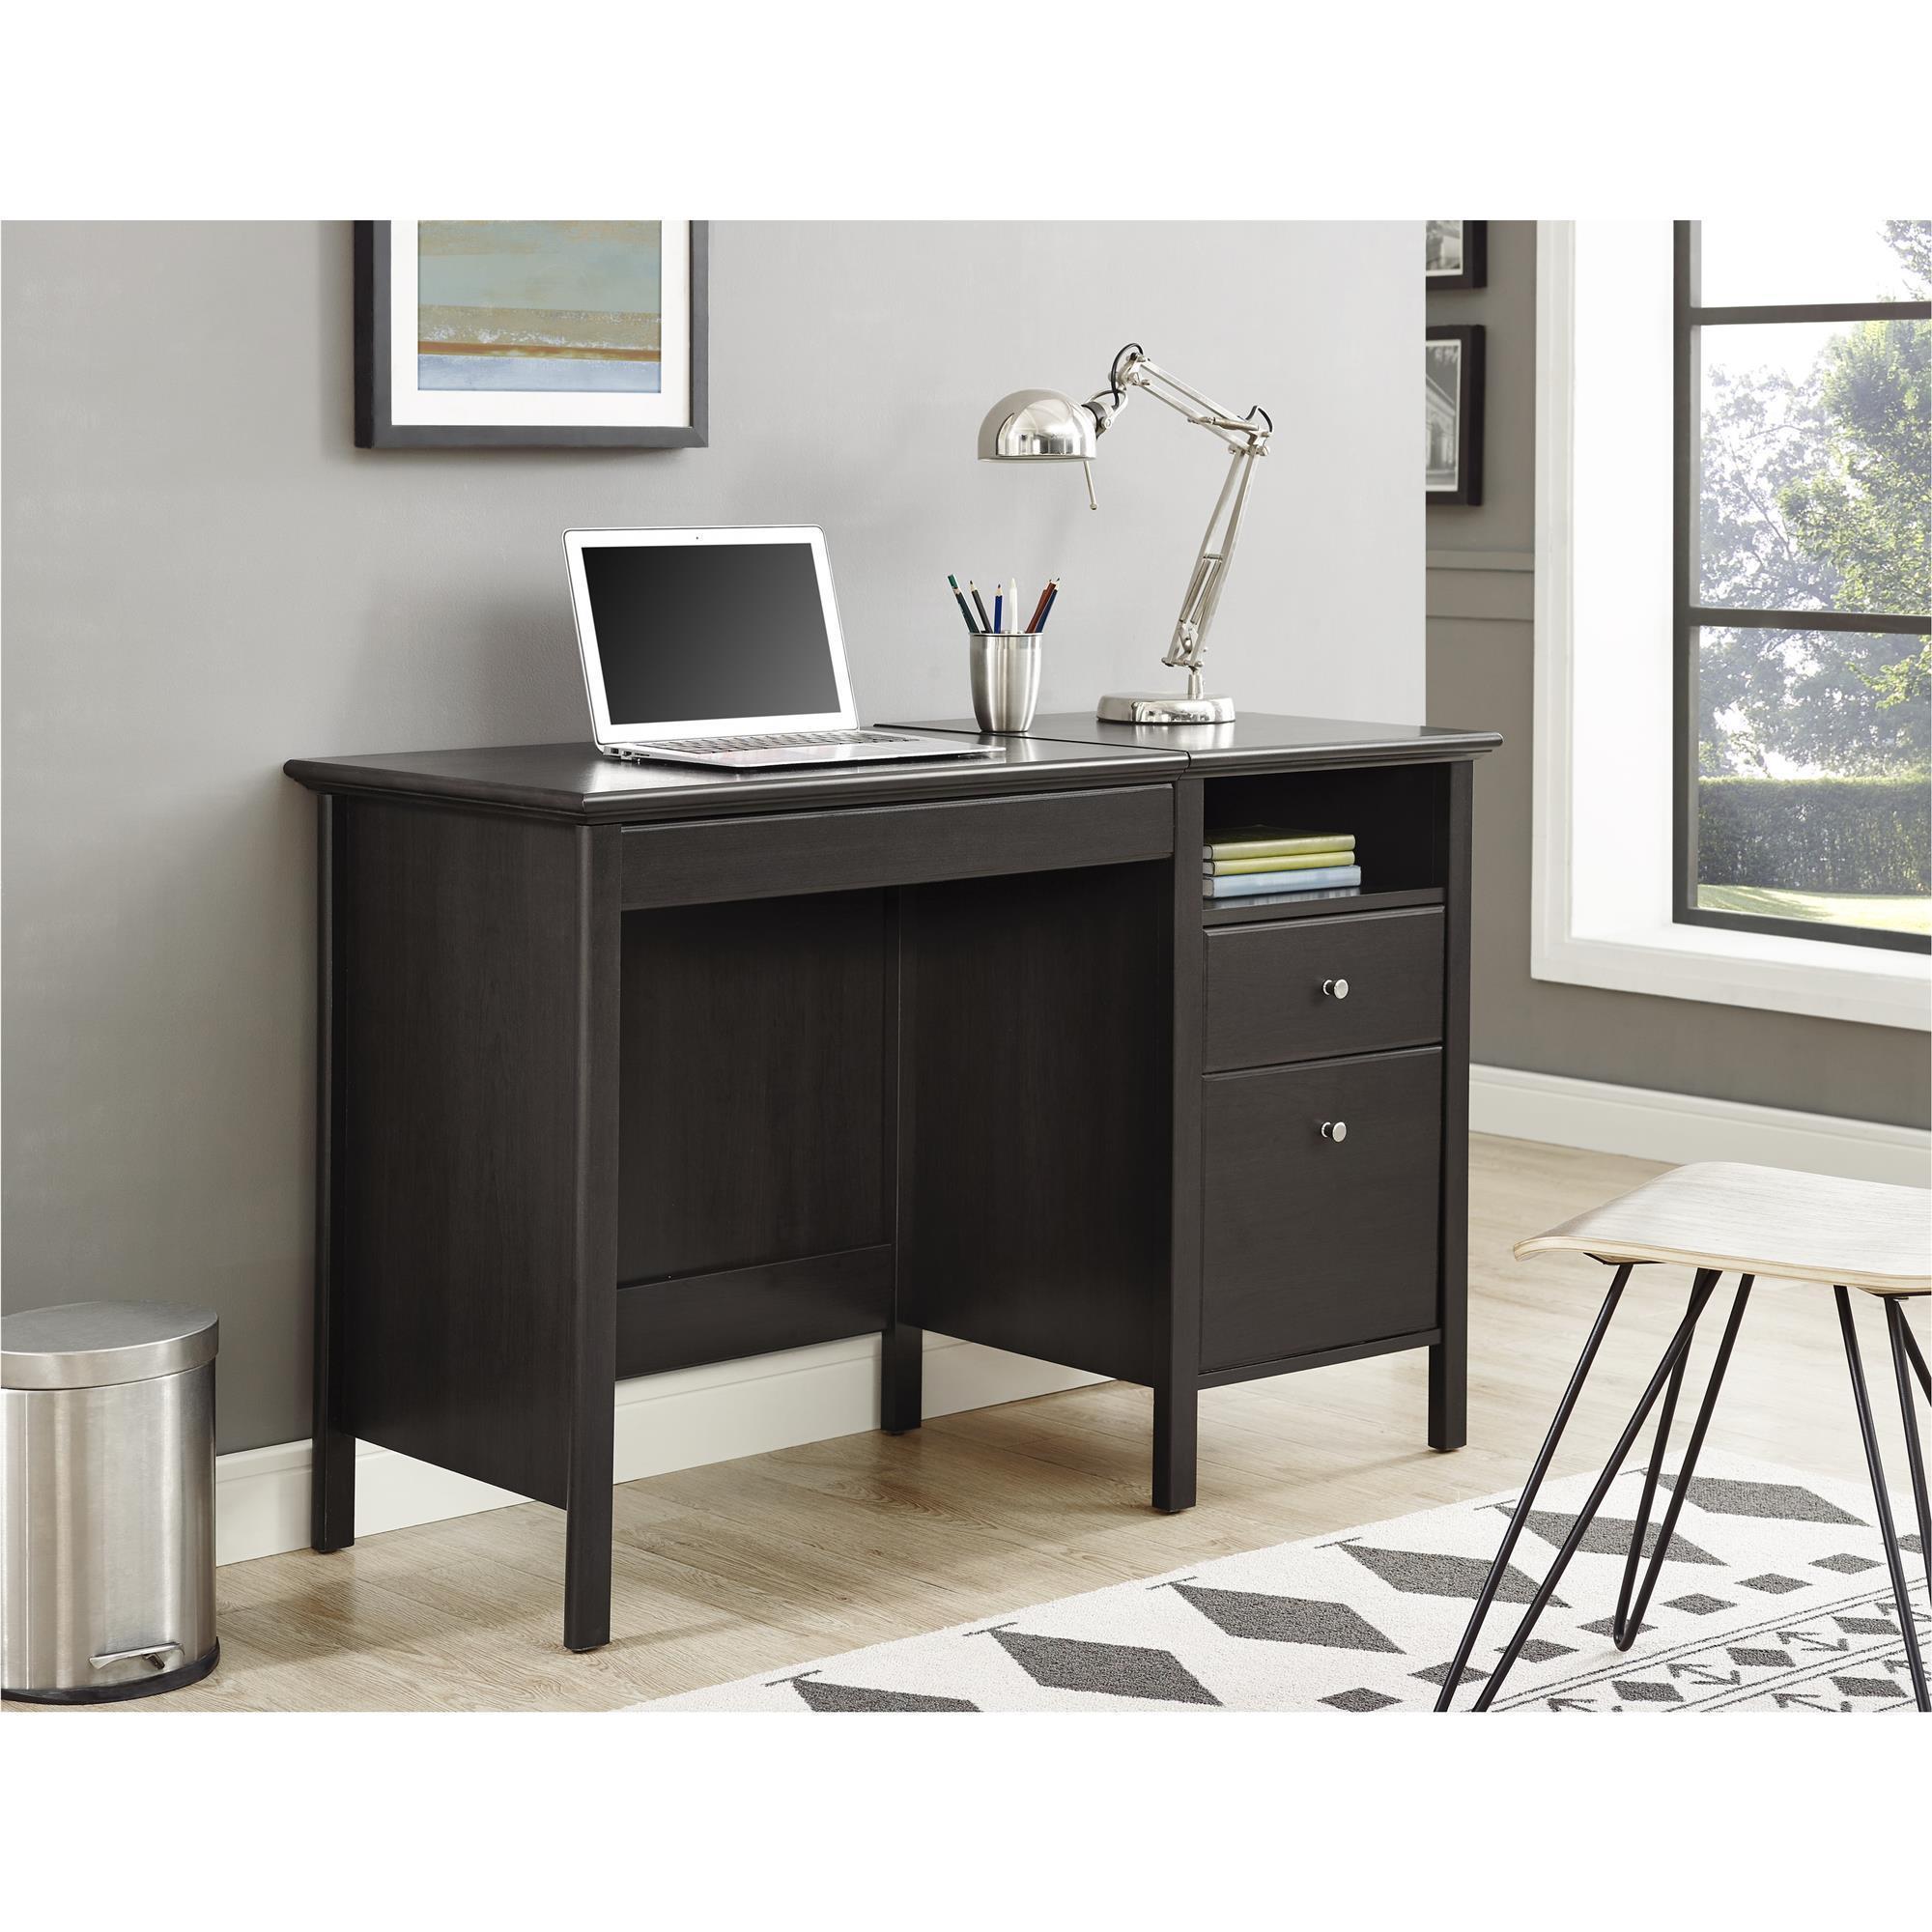 lift top desk. Shop Ameriwood Home Adler Lift-Top Desk - Free Shipping Today Overstock.com 16525592 Lift Top